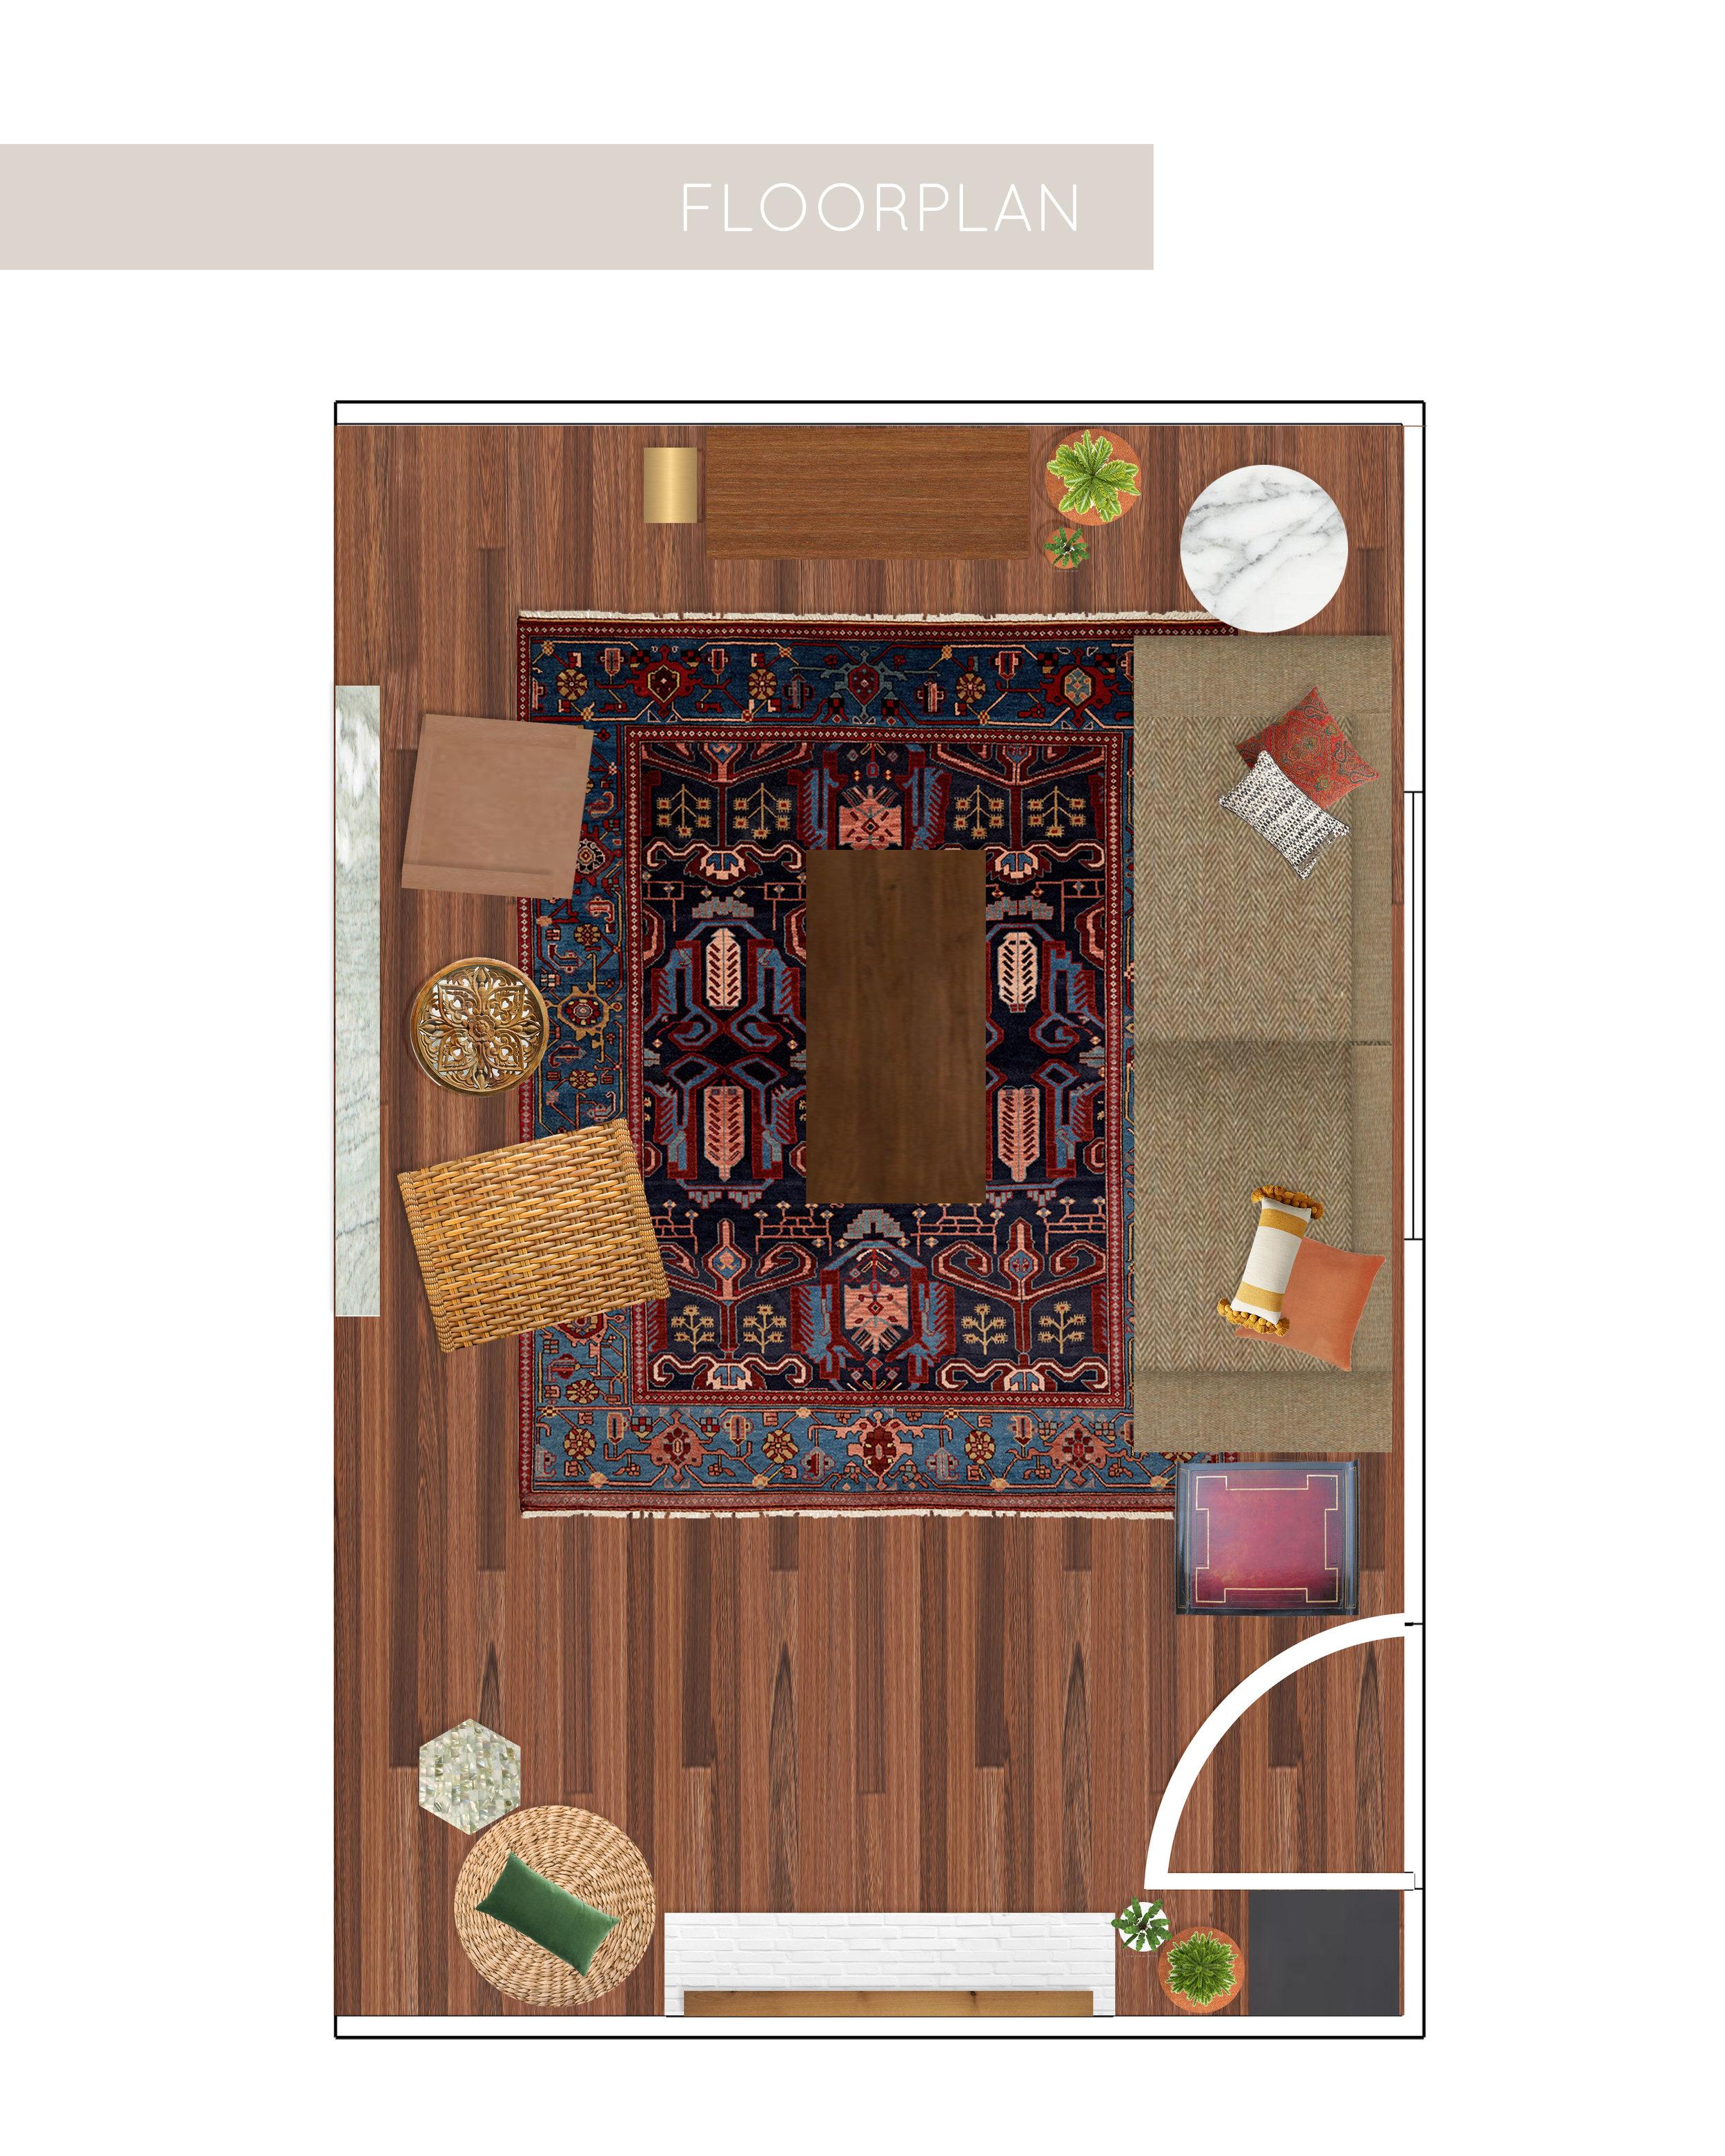 Love_Ding_Design_Blog_Spruce_Kit_Project_Update_Silapachai_Spruce.jpg